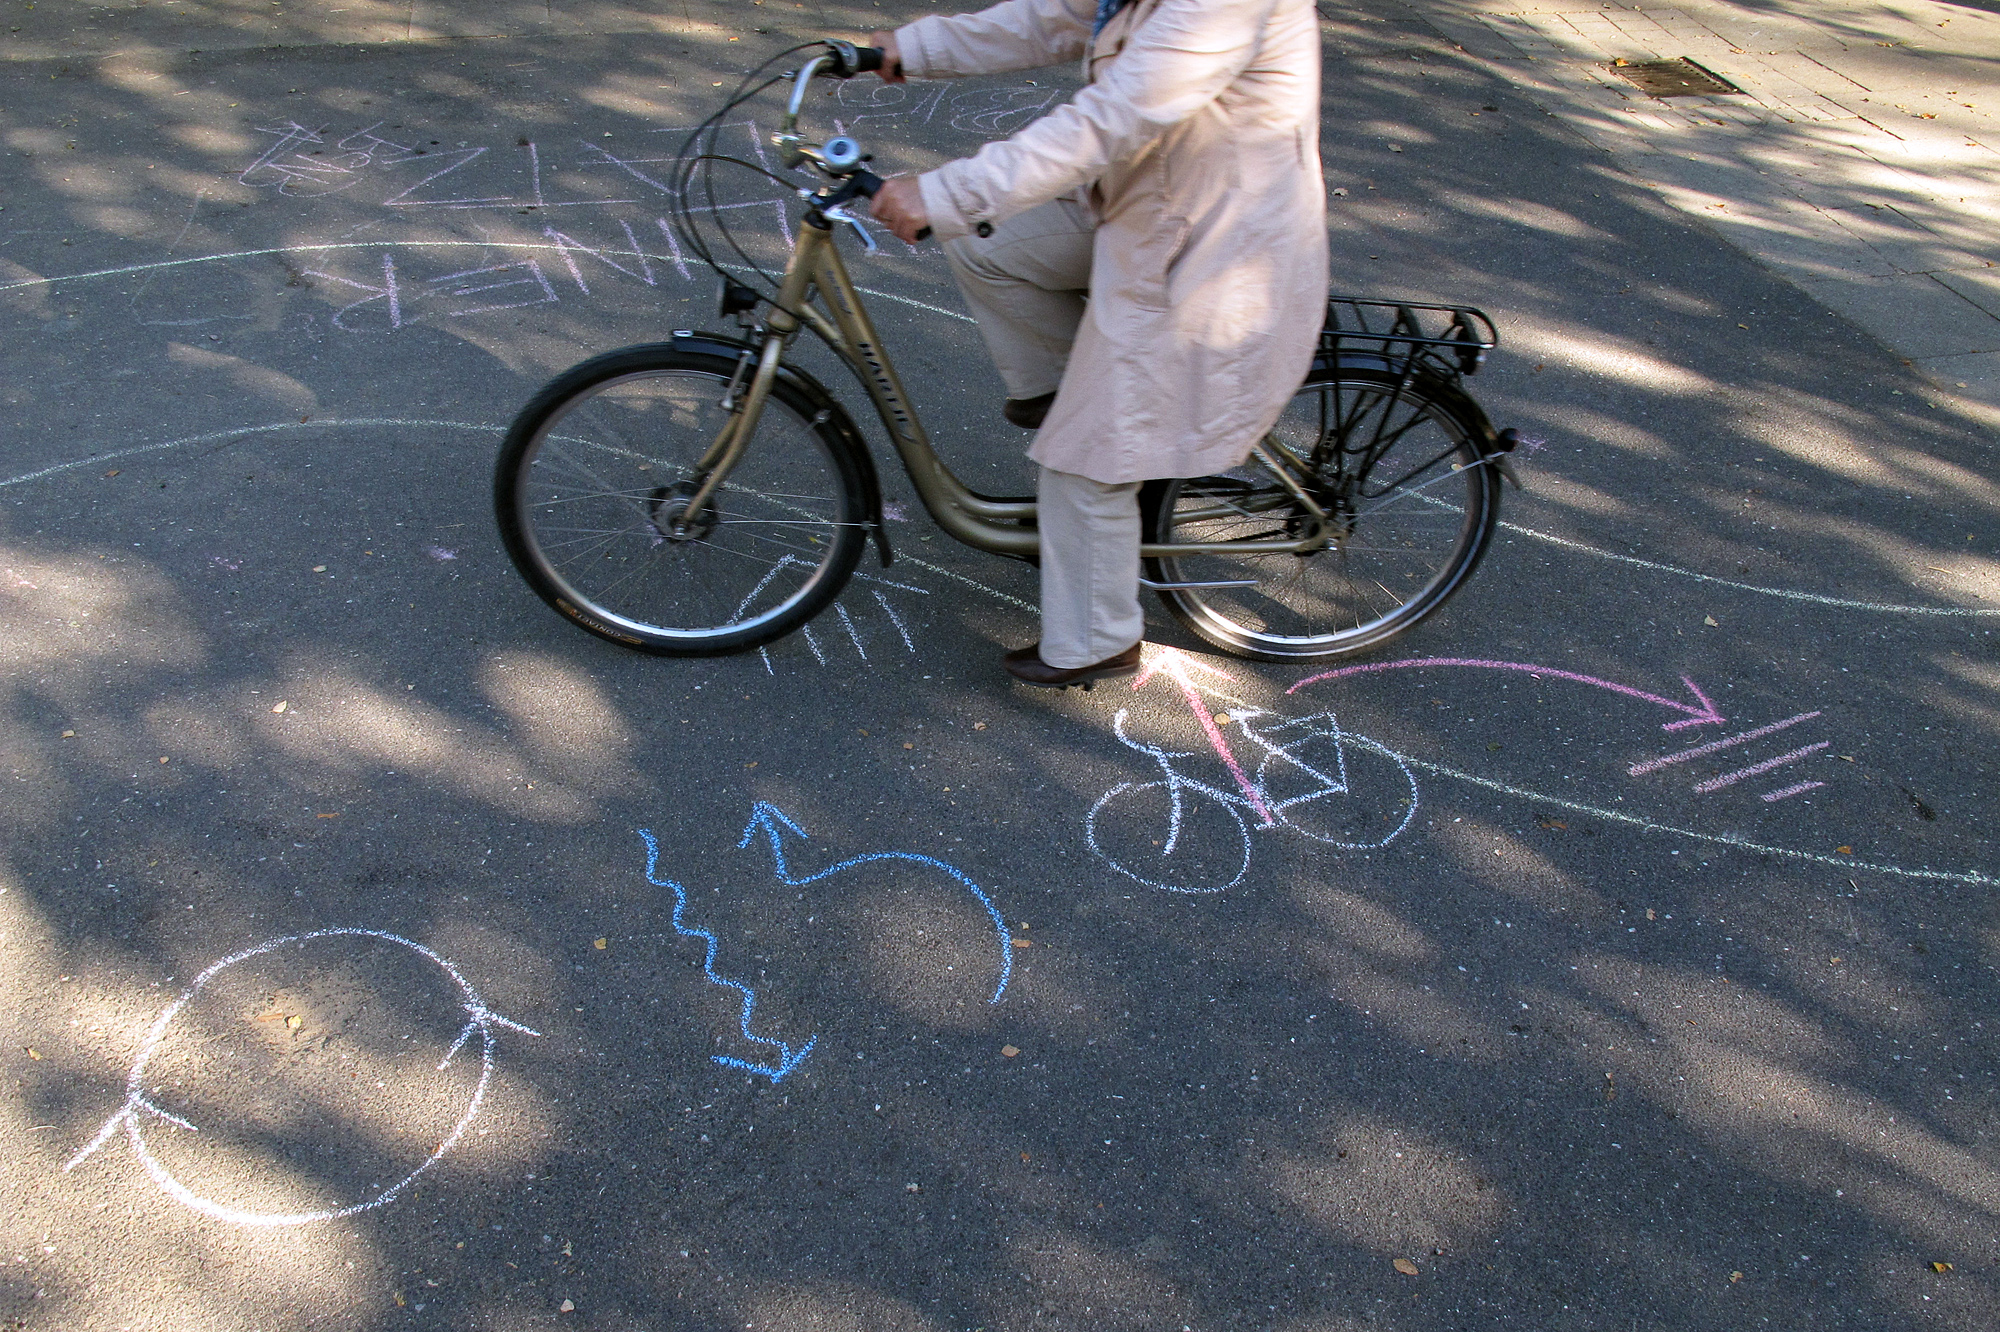 Teilnehmerin auf dem Platz - Foto Christian Burmeister